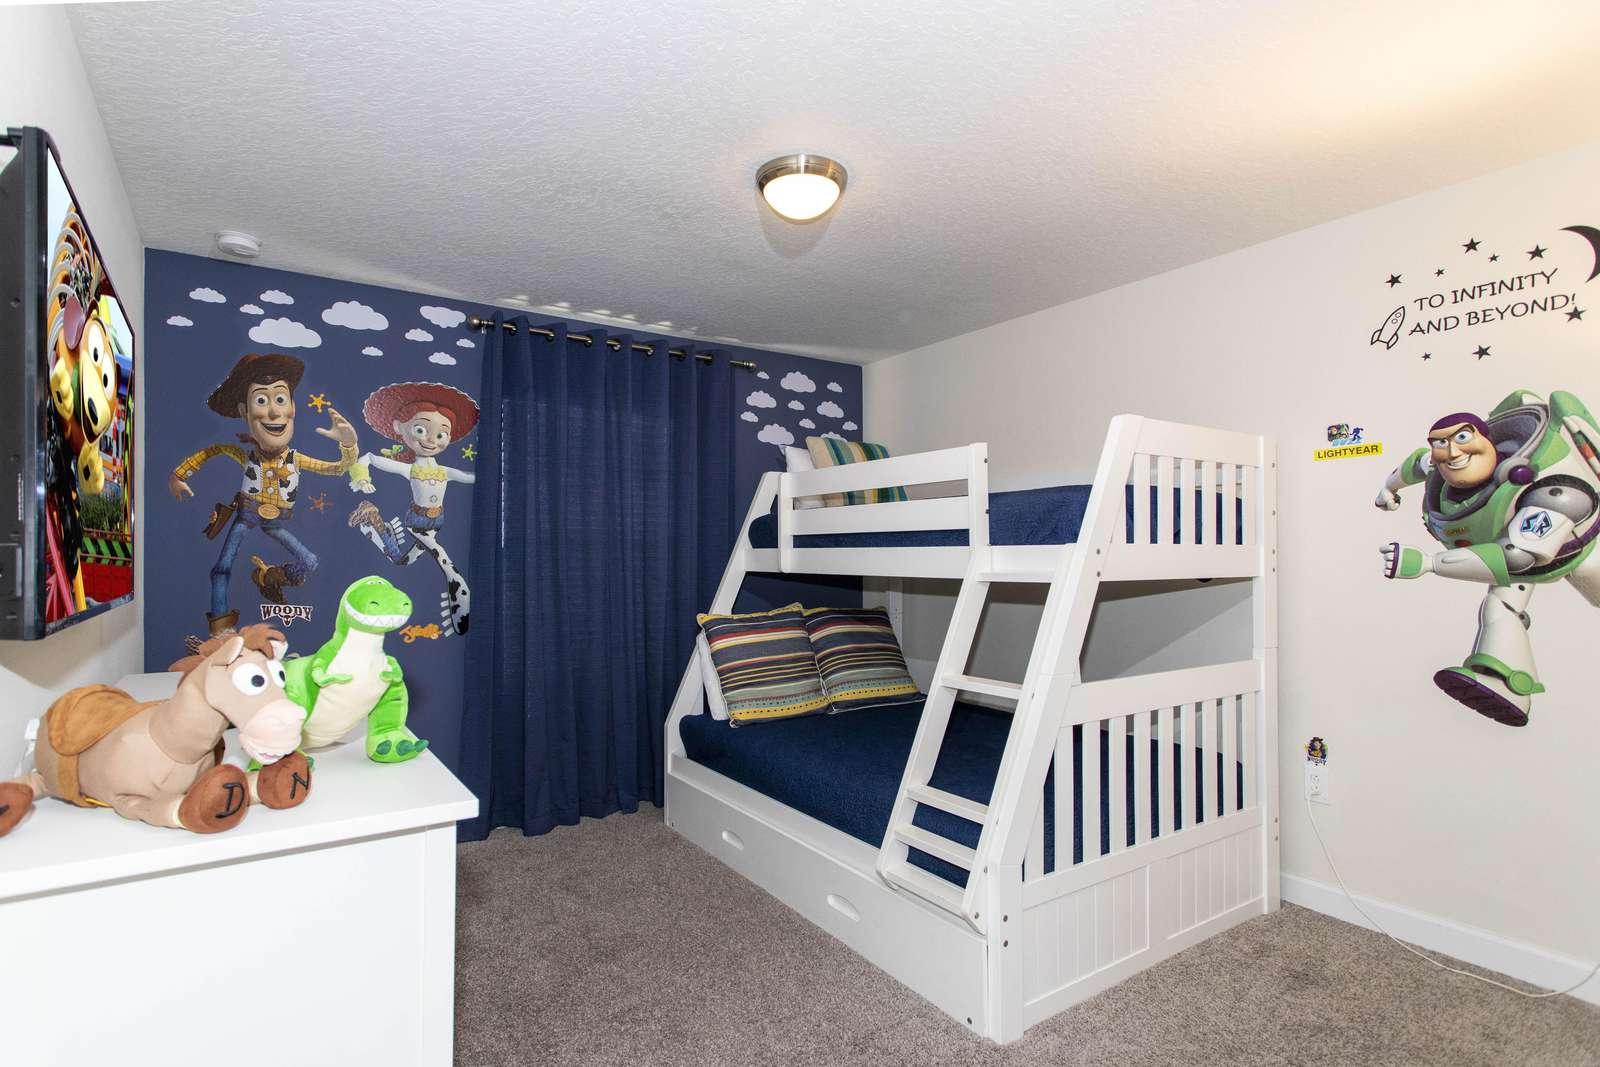 Toy Story Room (Sleep 4) 2ND FLOOR - property